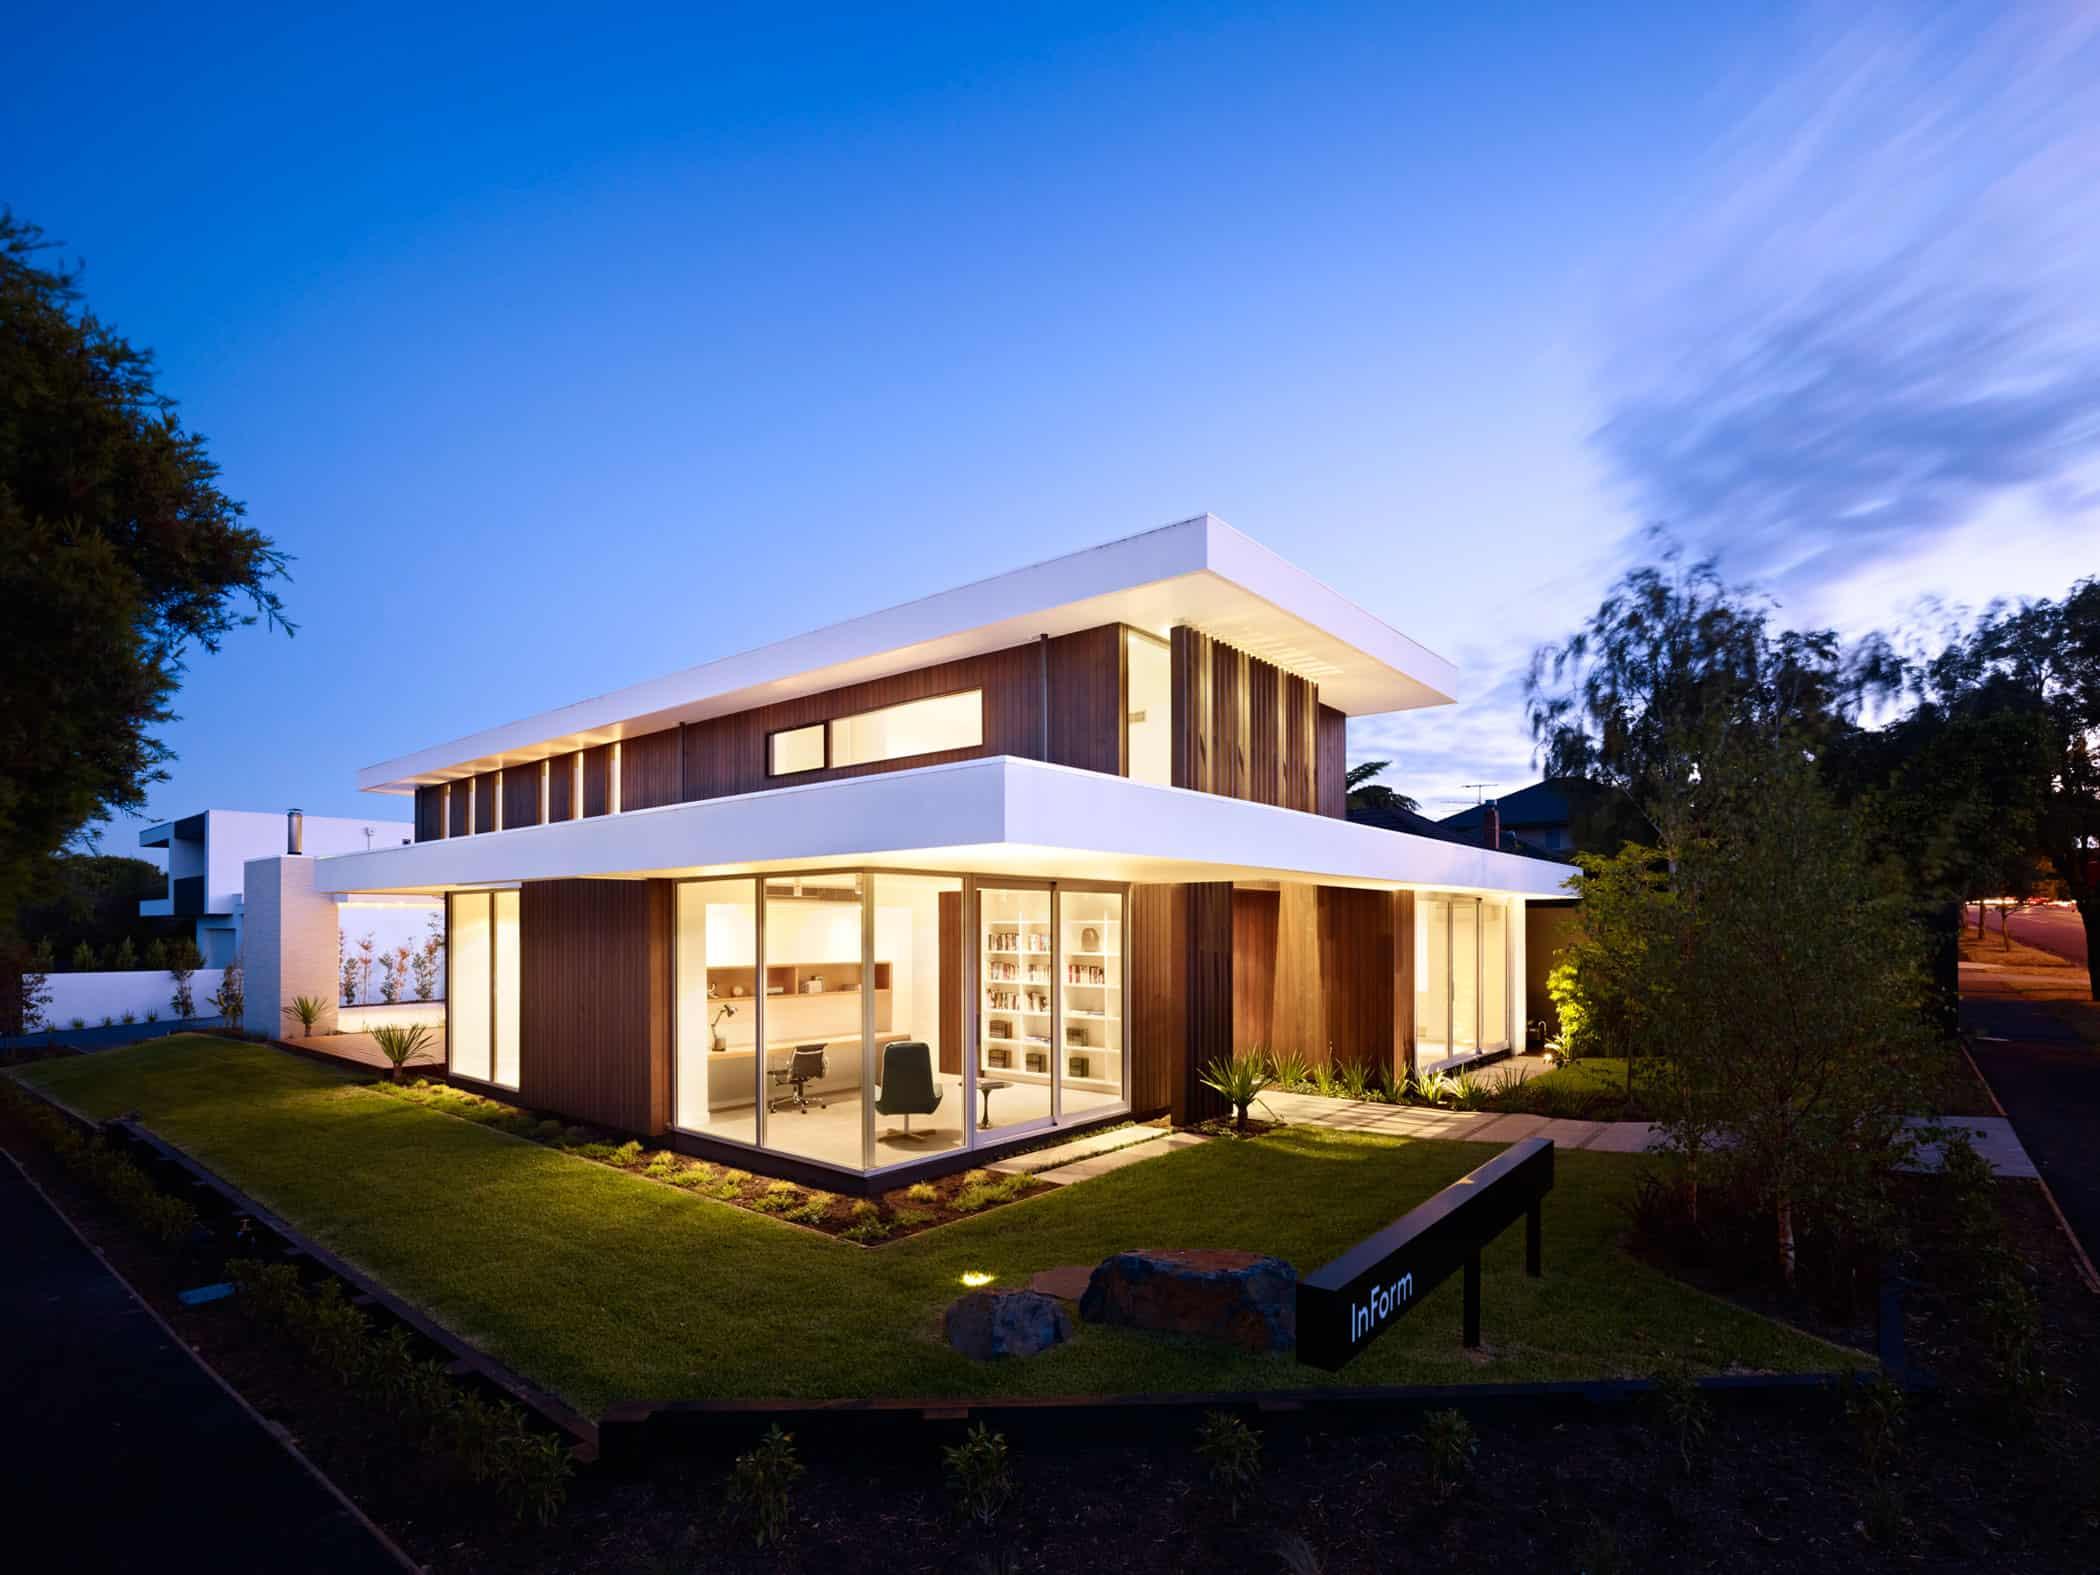 California House By Inform Design & Pleysier Perkins (1